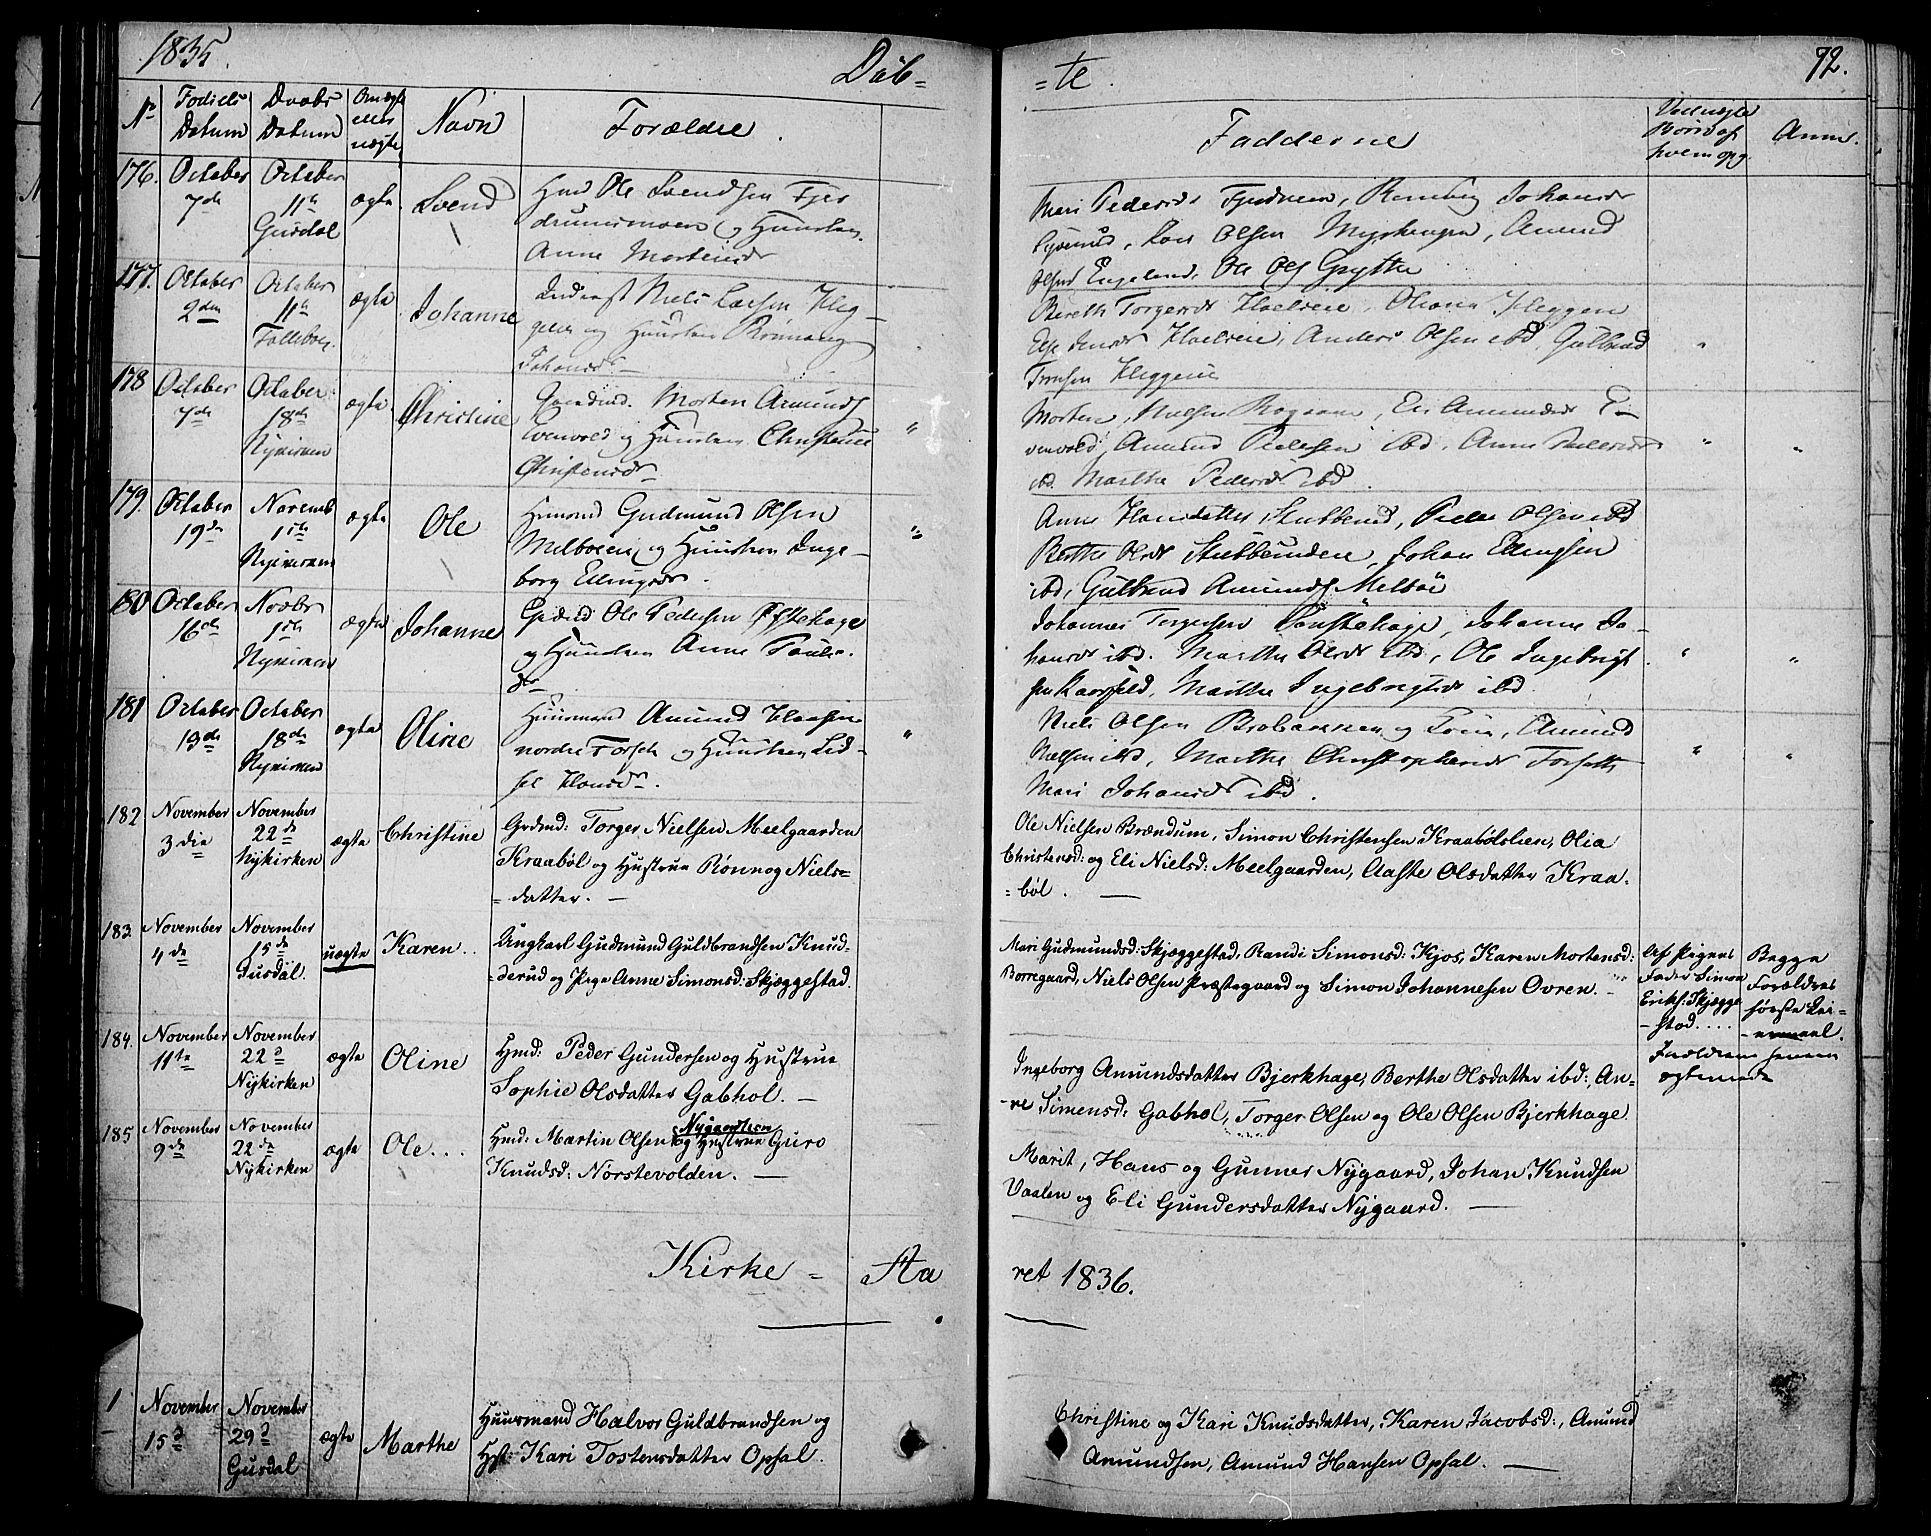 SAH, Gausdal prestekontor, Ministerialbok nr. 6, 1830-1839, s. 72